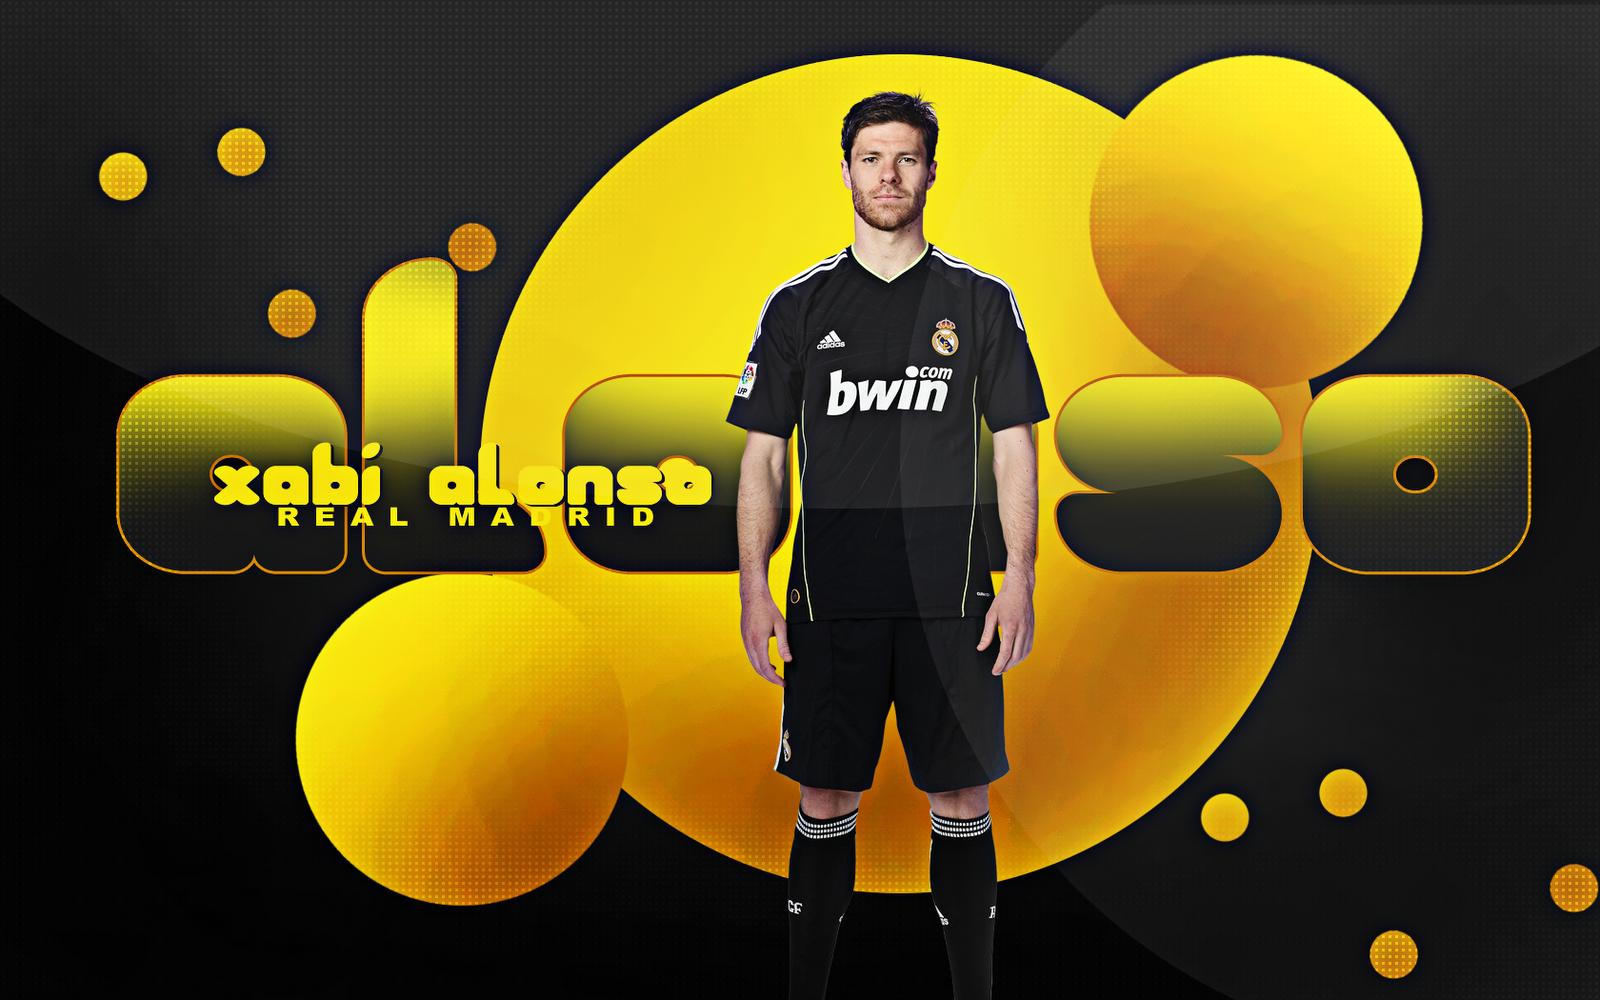 Xabi Alonso Football Wallpaper   Football HD Wallpapers 1600x1000